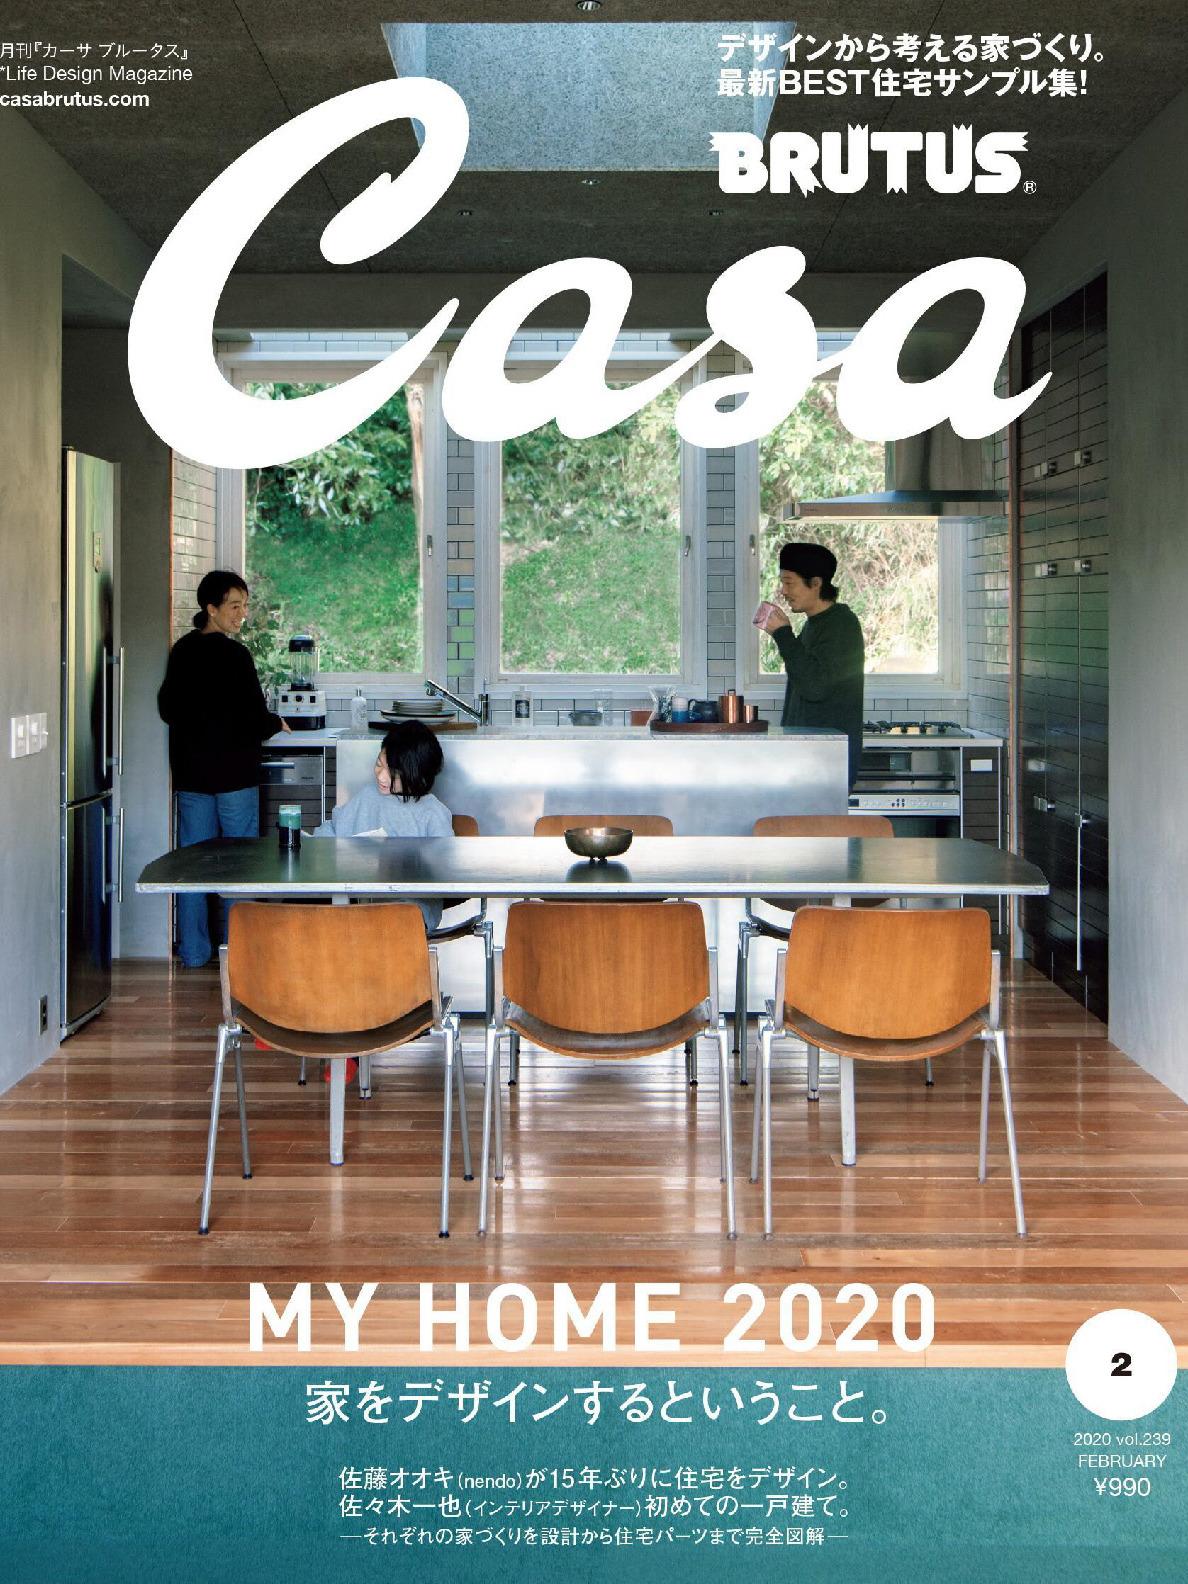 《Casa Brutus》日本室内设计流行趋势杂志2020年02月号